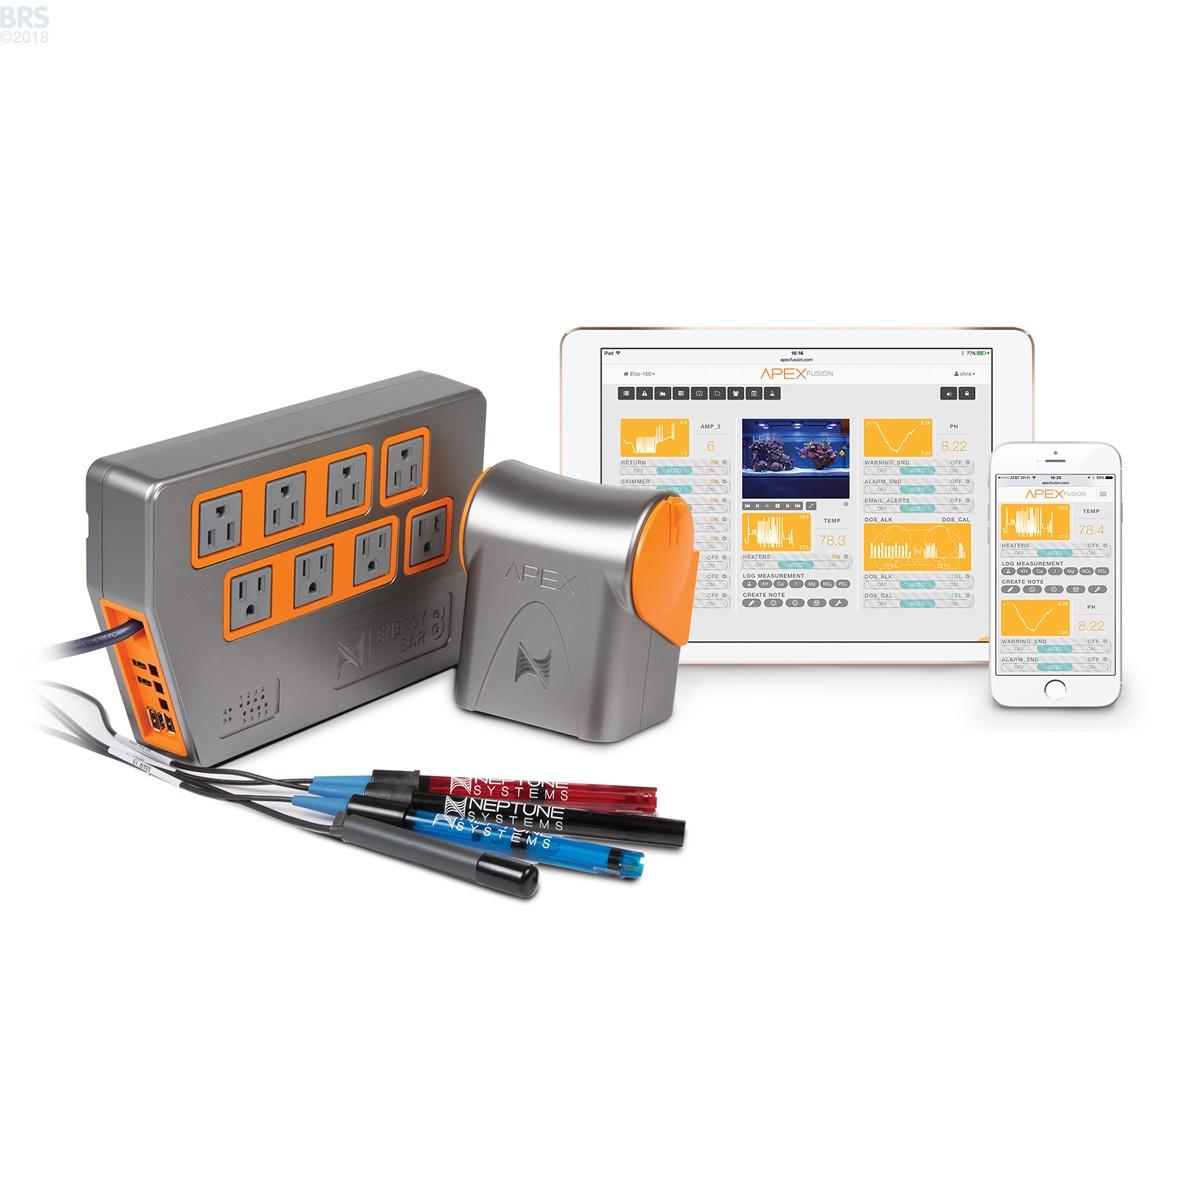 apex controller system neptune systems bulk reef supply rh bulkreefsupply com Neptune Apex Plug Power Neptune Apex Plug Power